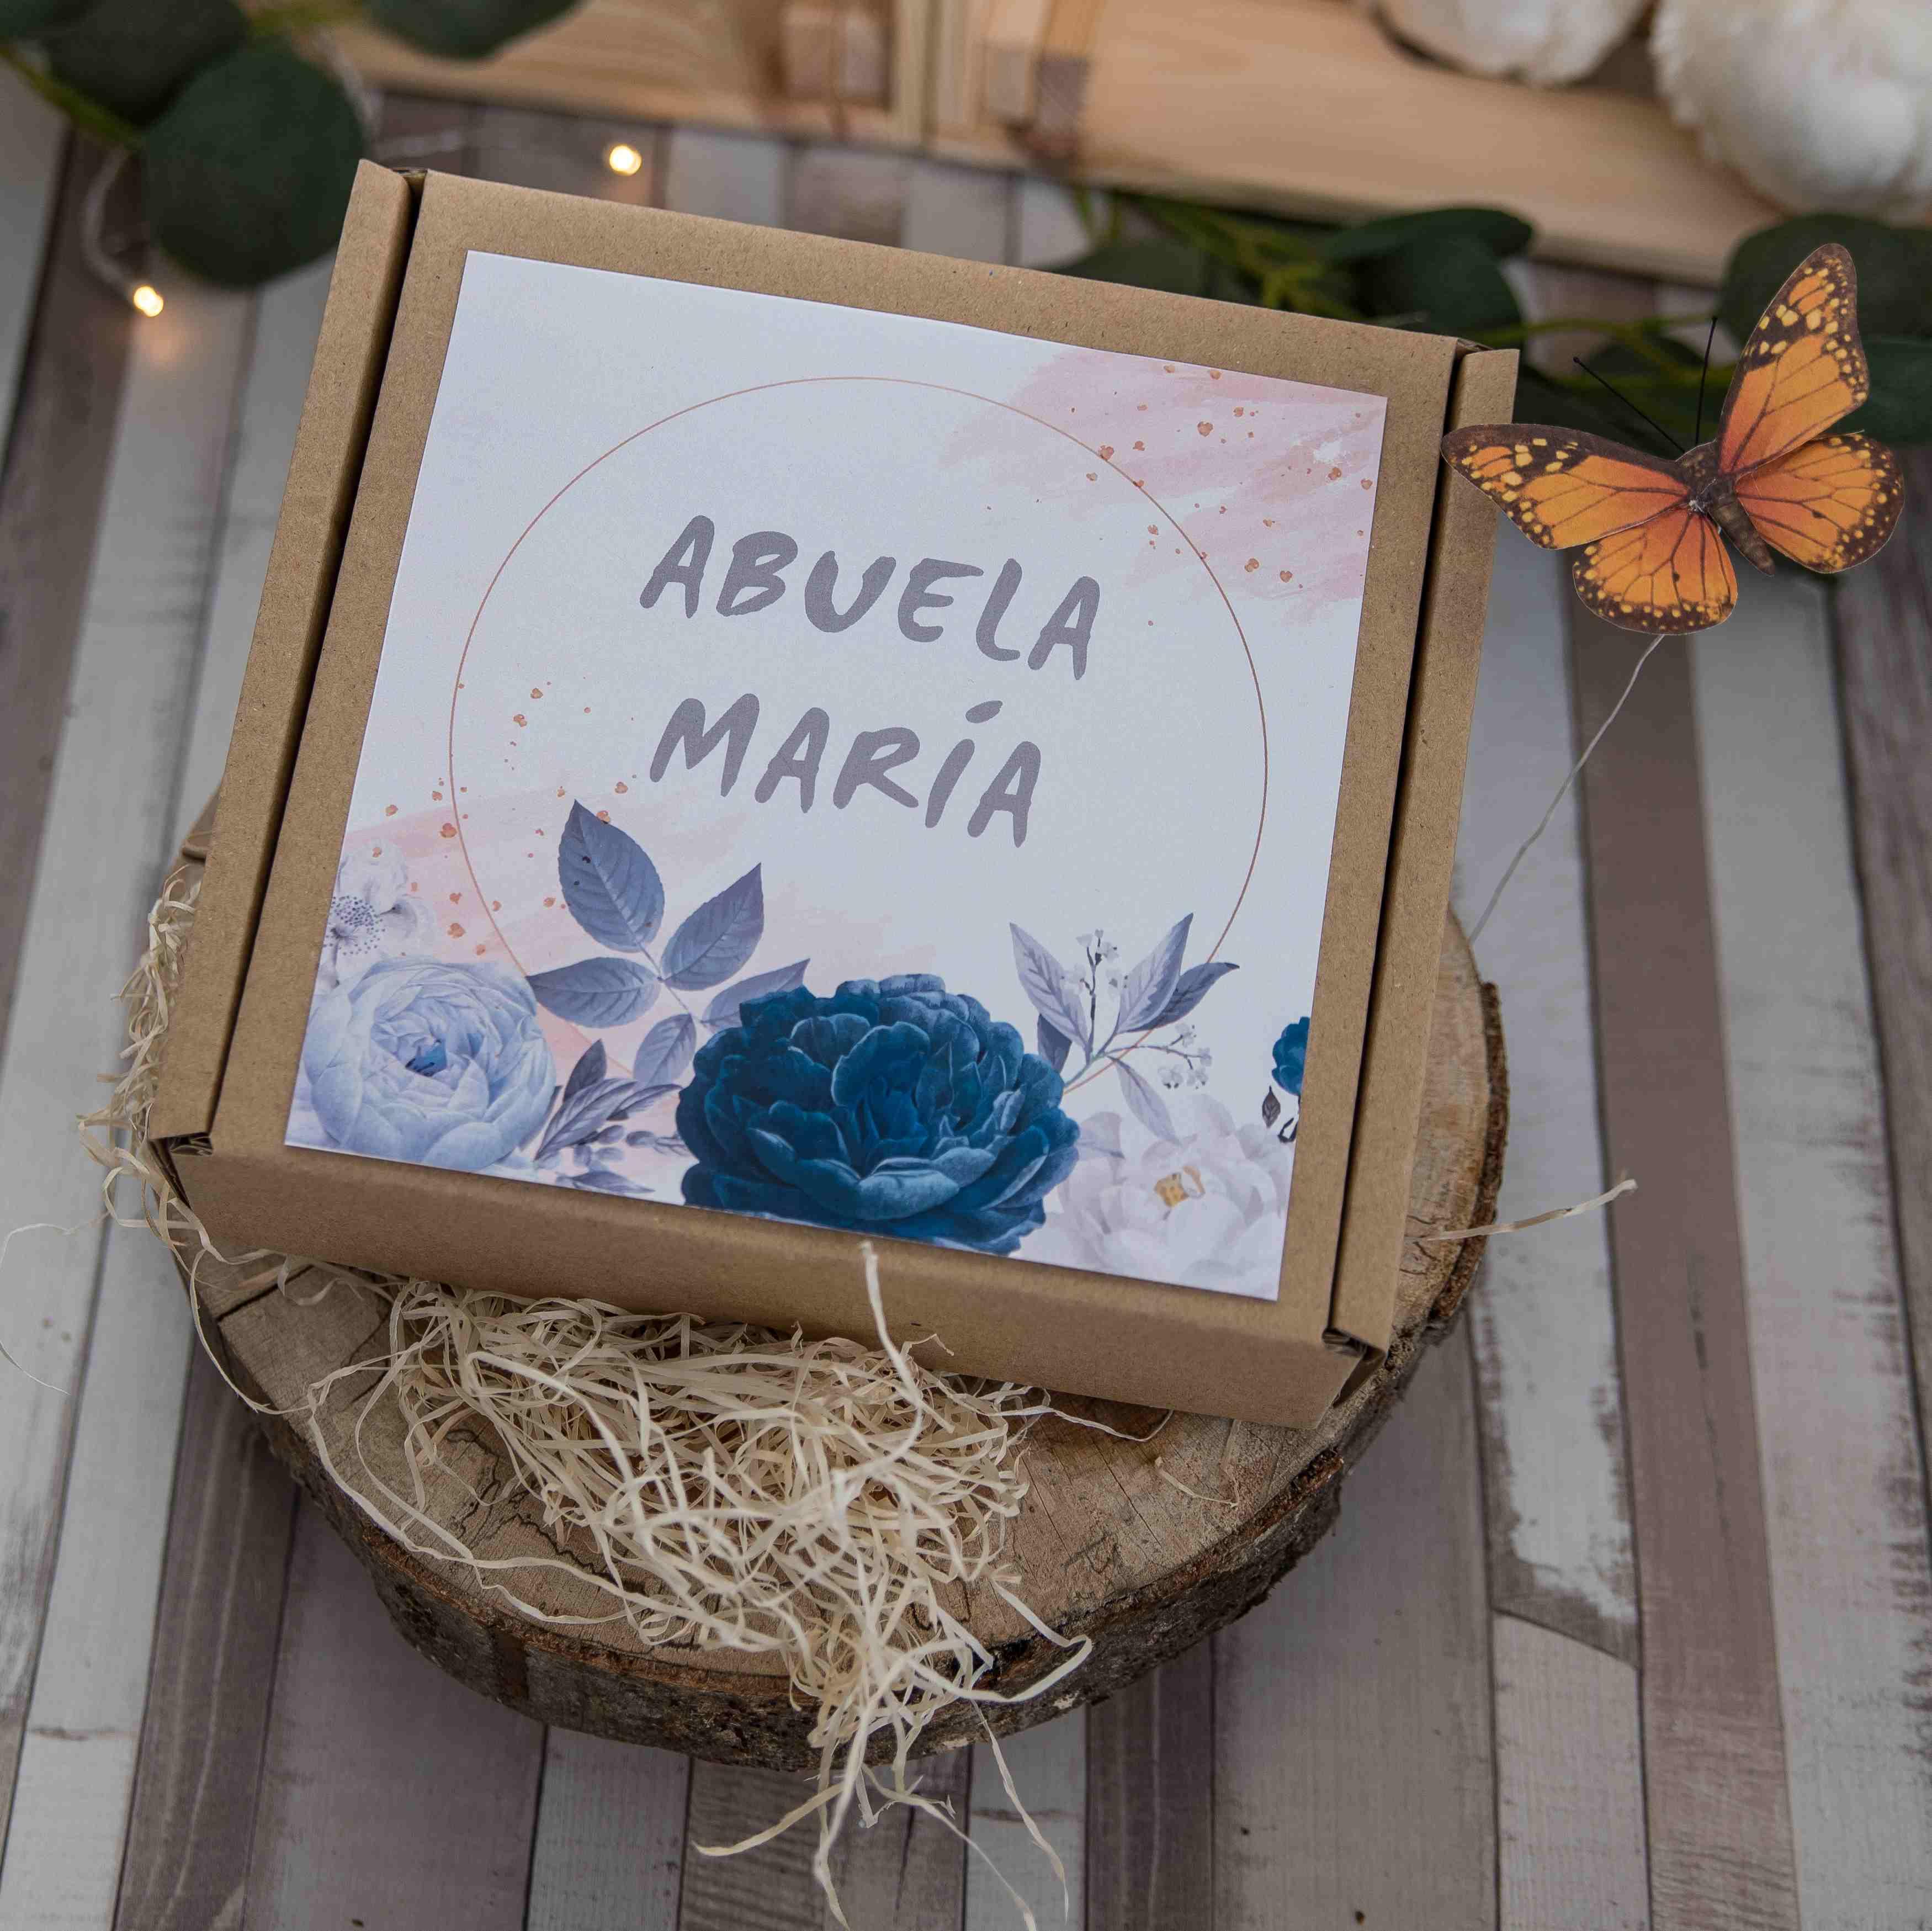 Abuela box